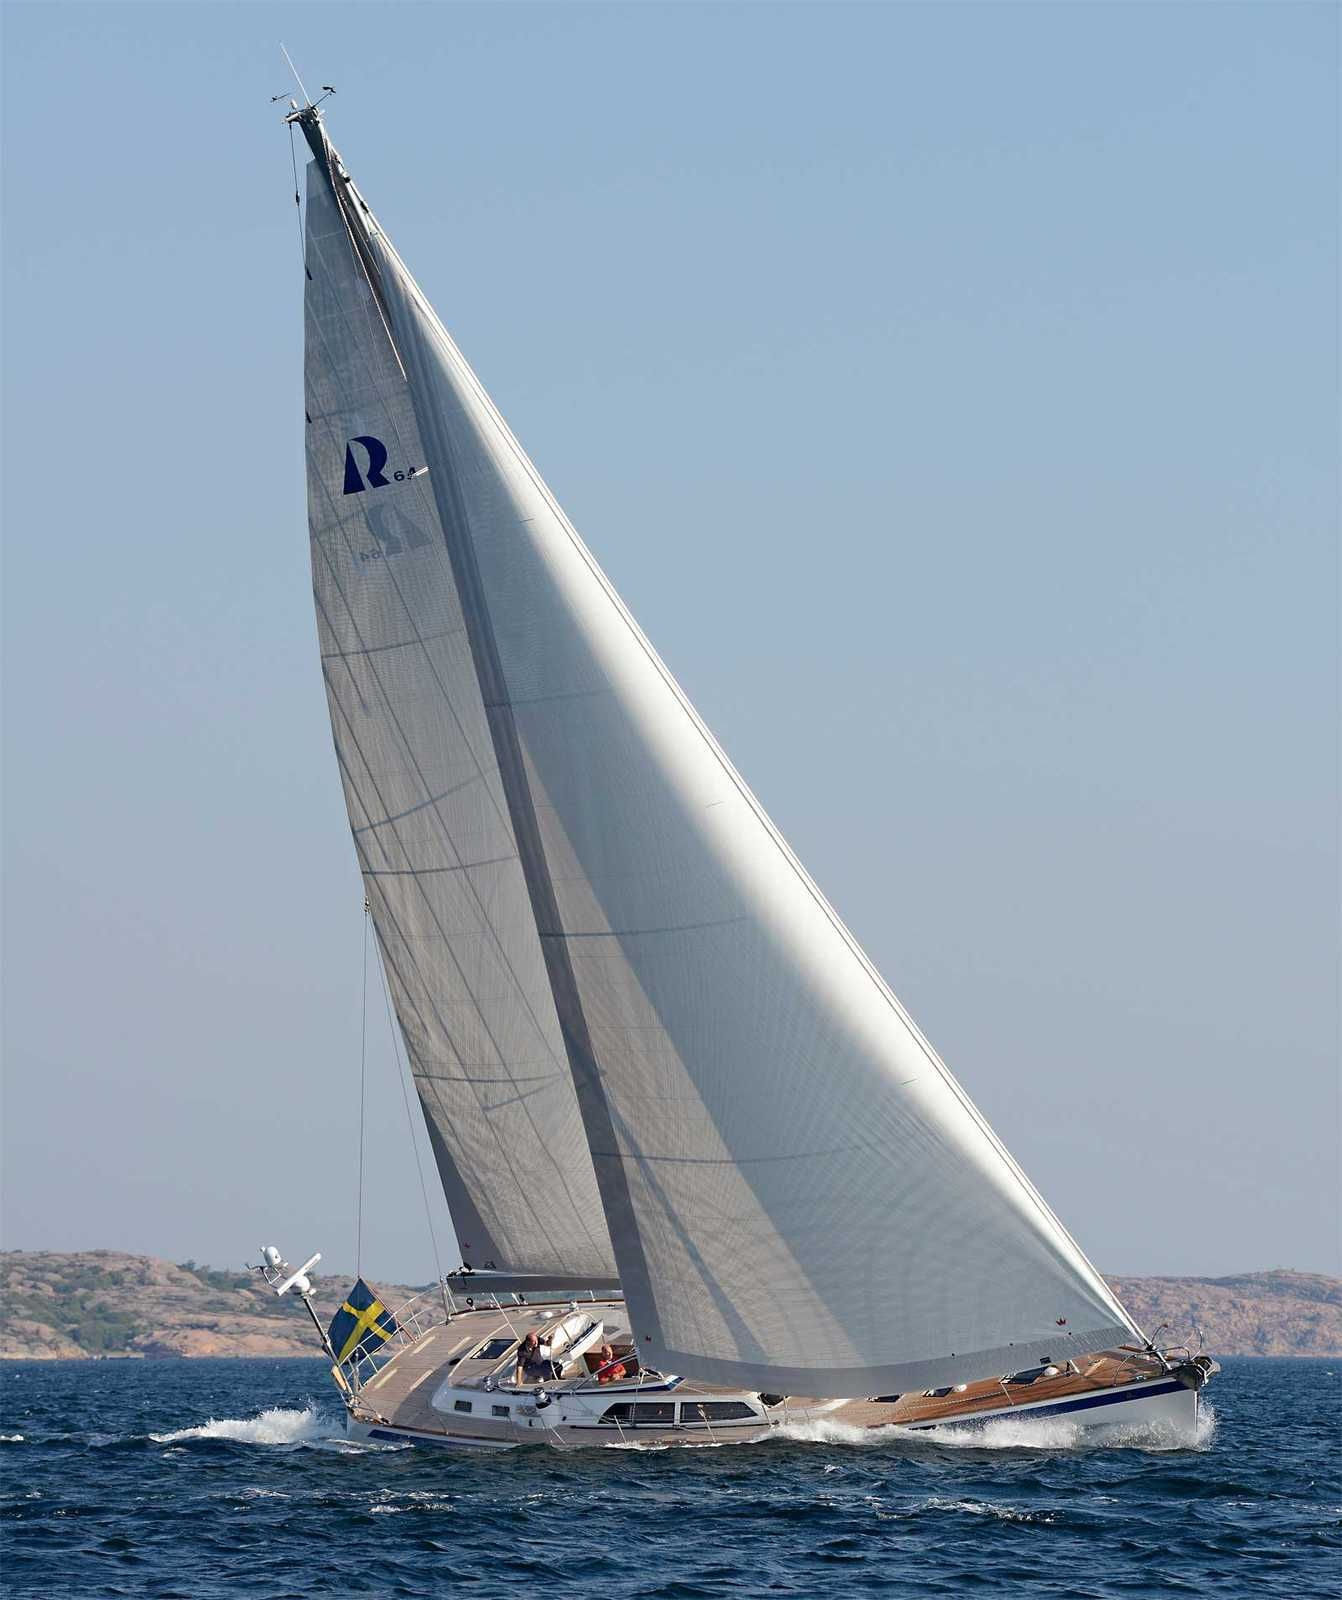 Hallberg Rassy Yachts Center Cockpit Boats In 2020 Sailing Boat Sailing Yacht